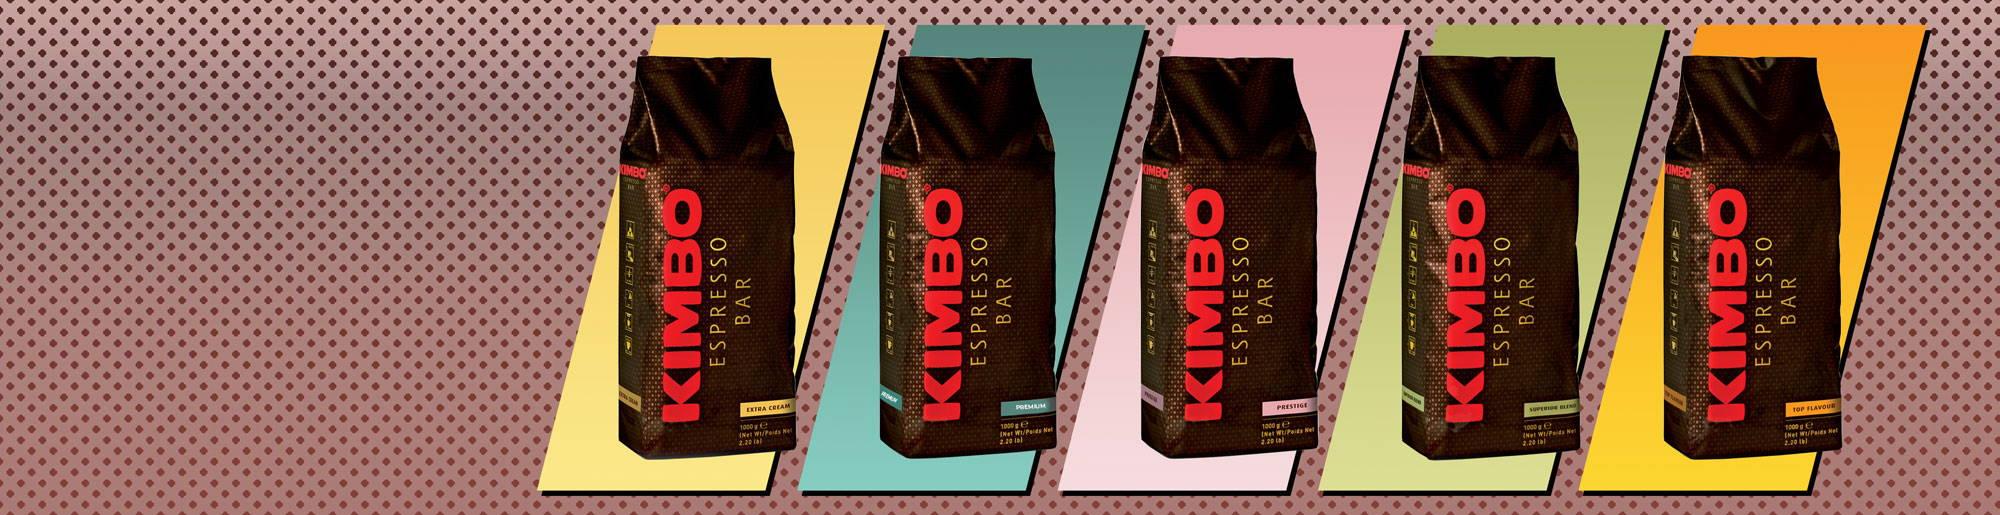 Kimbo Professional Coffee